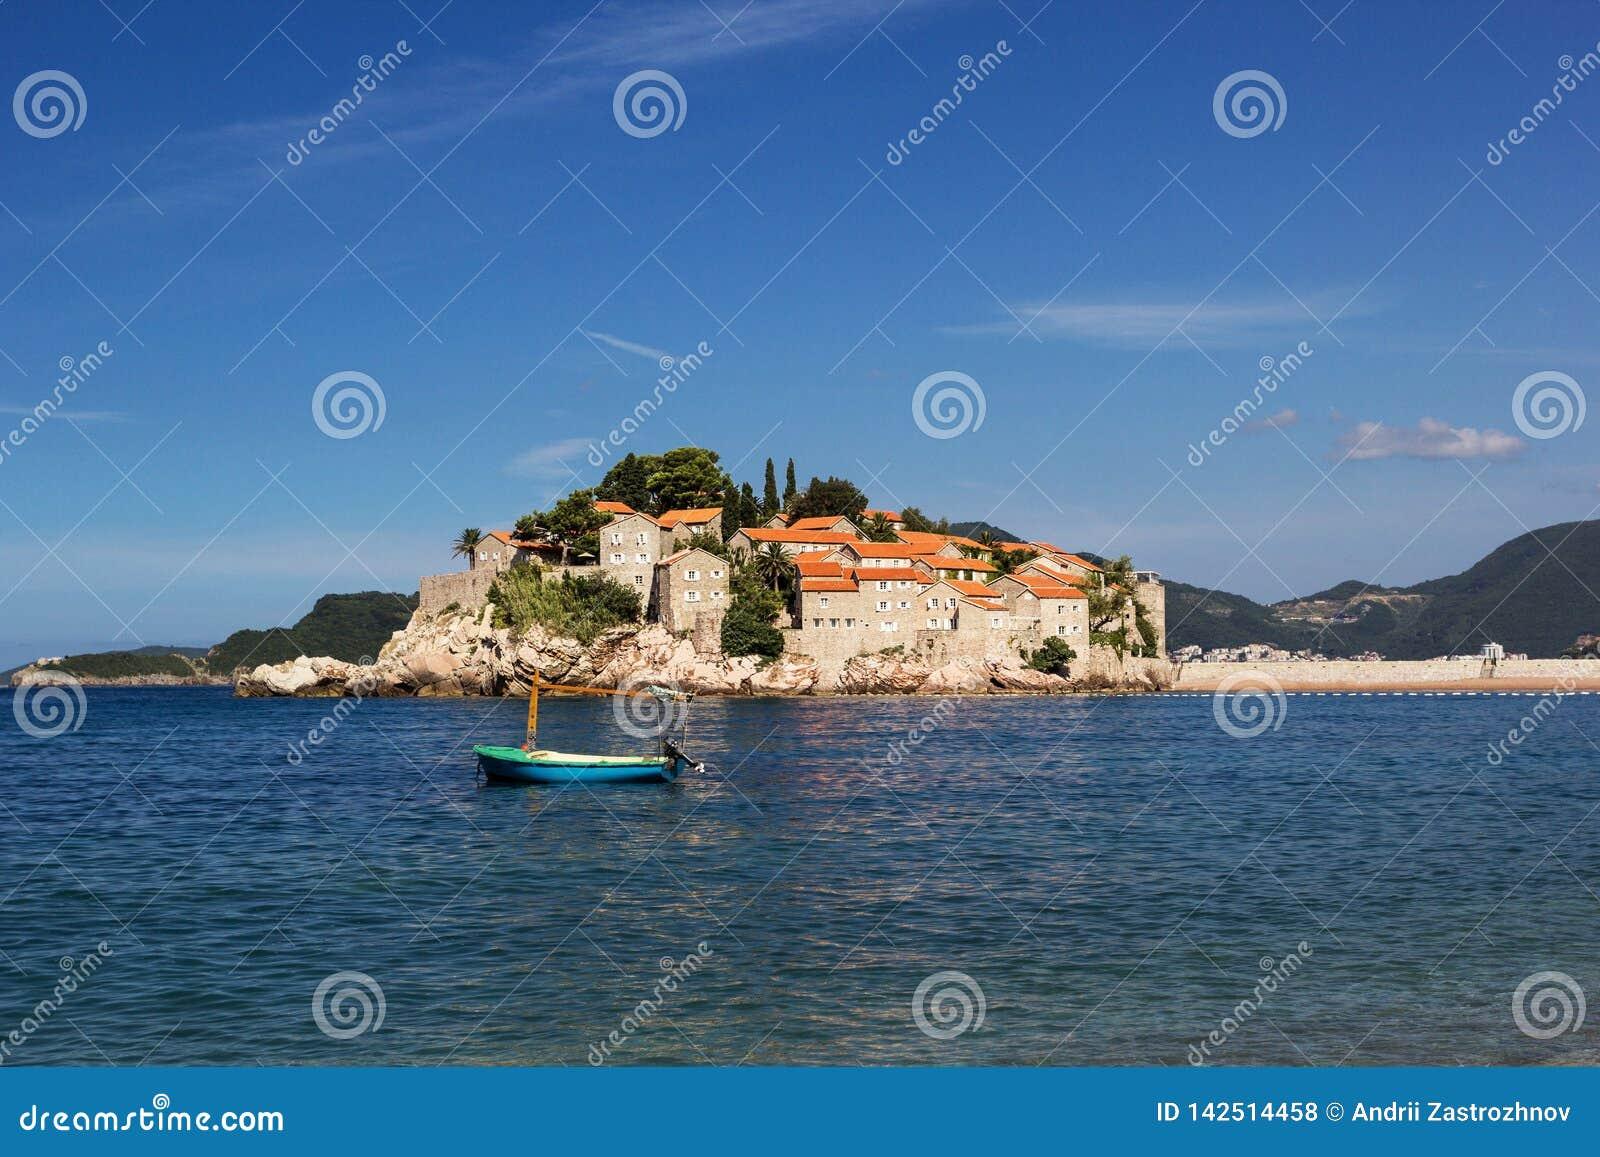 La isla de Sveti Stefan Barco en el primero plano